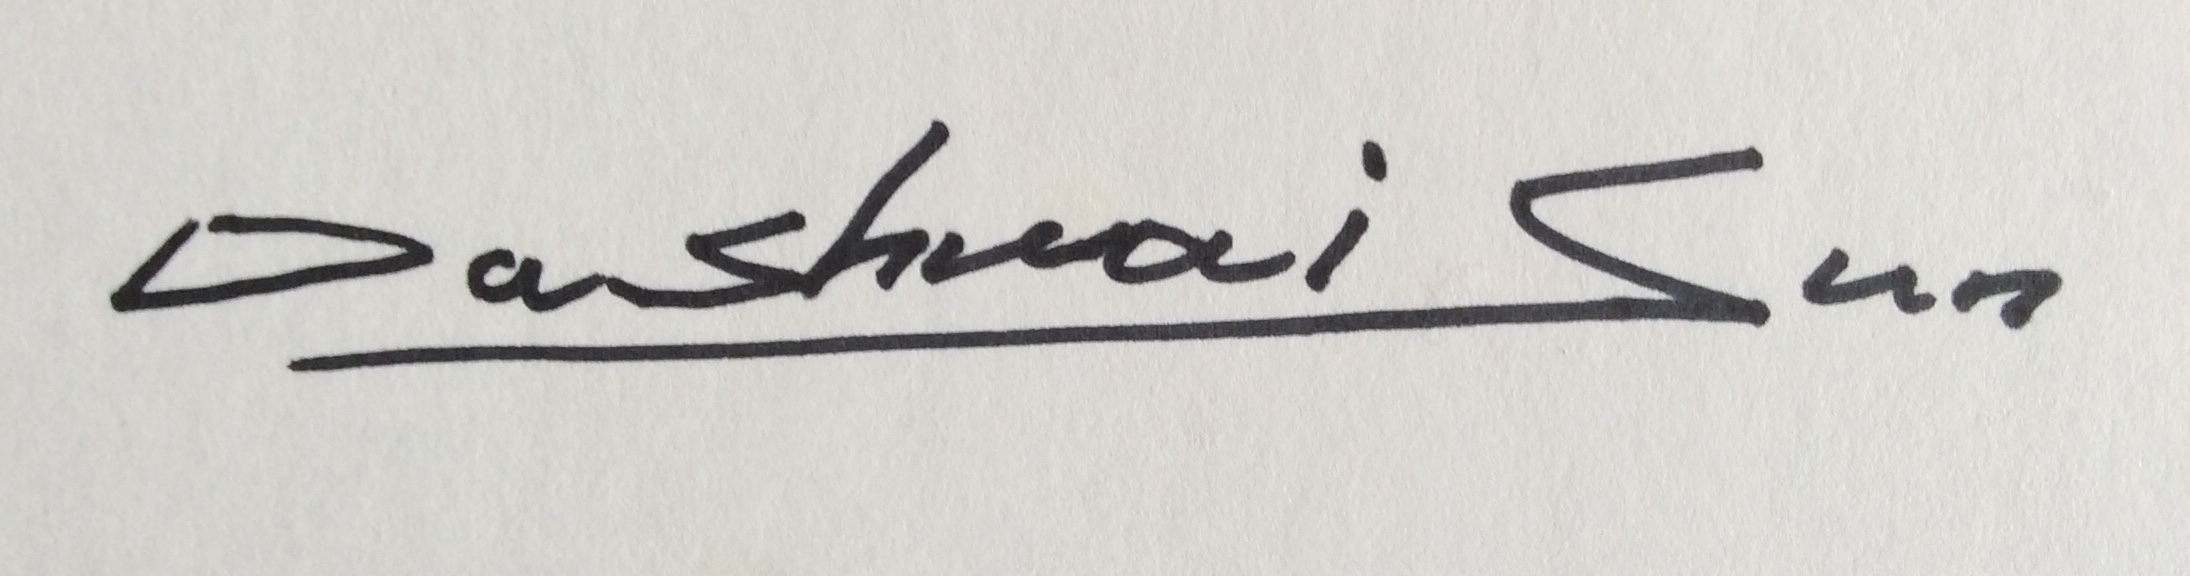 Dashuai sun Signature